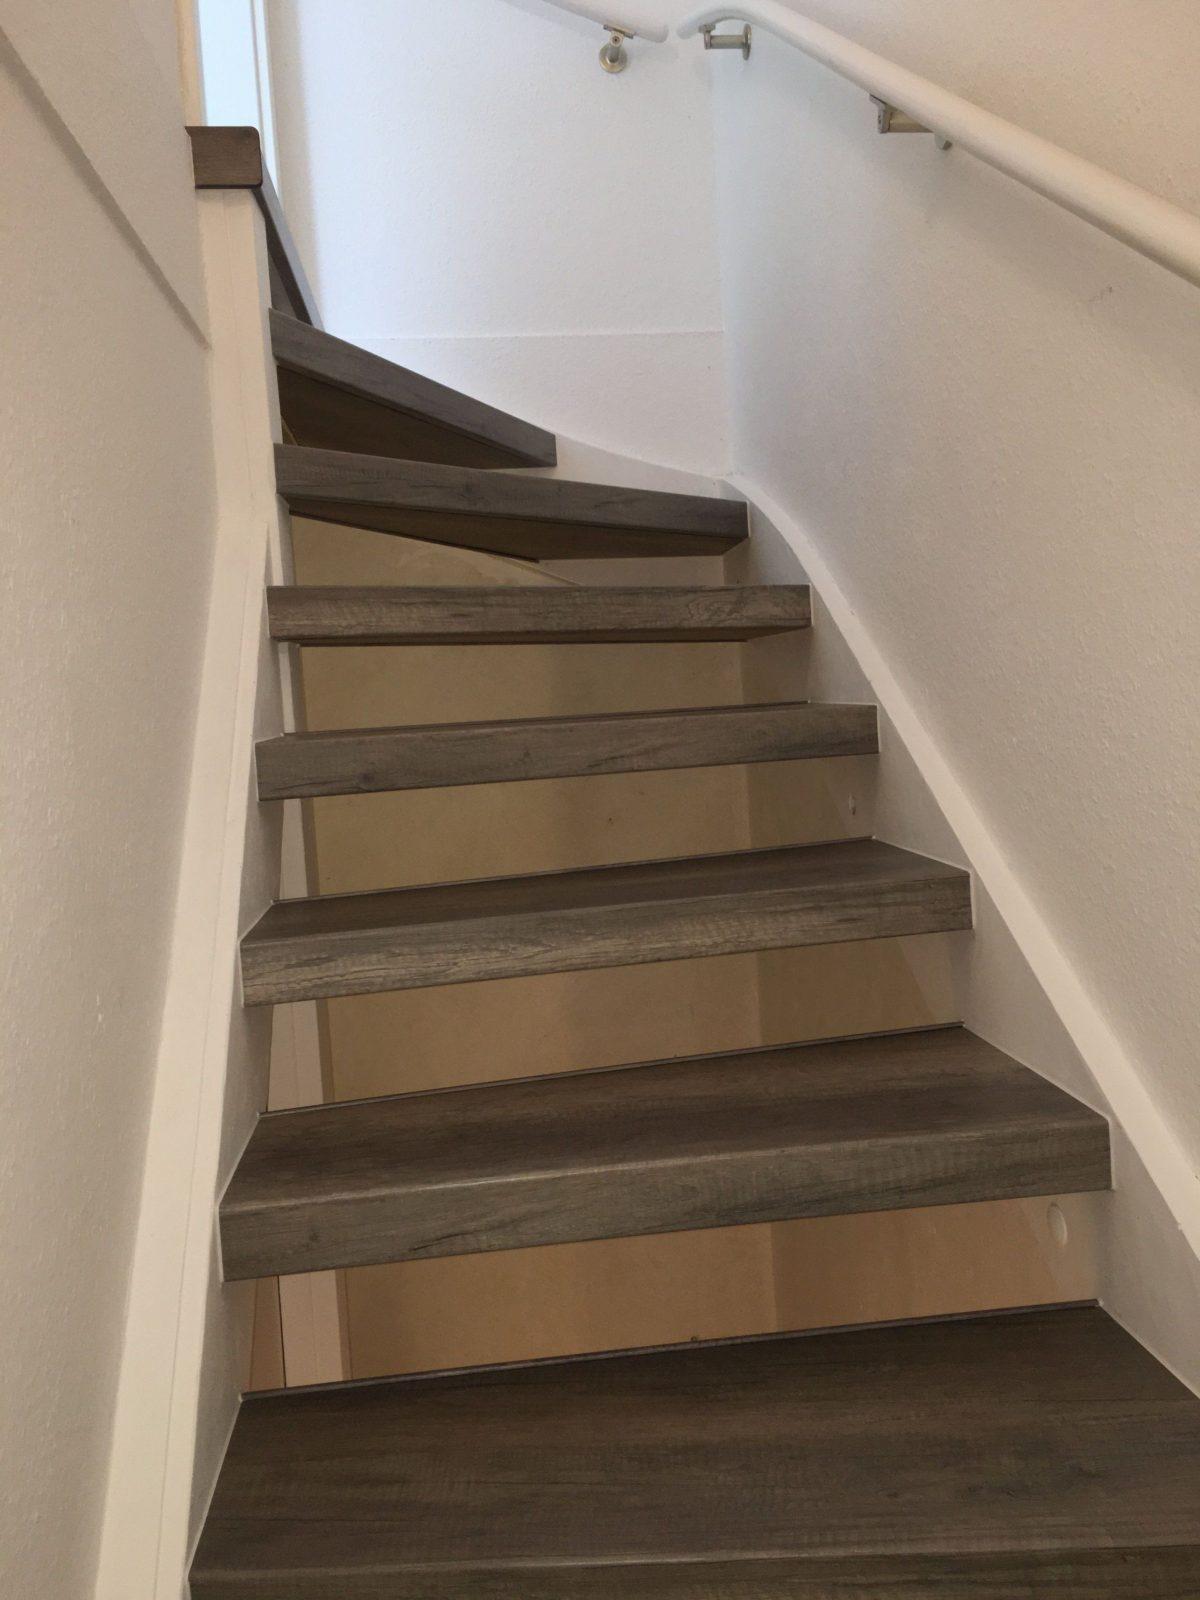 Offene Treppen Neu Gestalten  Alte Treppe Neu Gestalten  Pinterest von Alte Treppen Neu Gestalten Bild